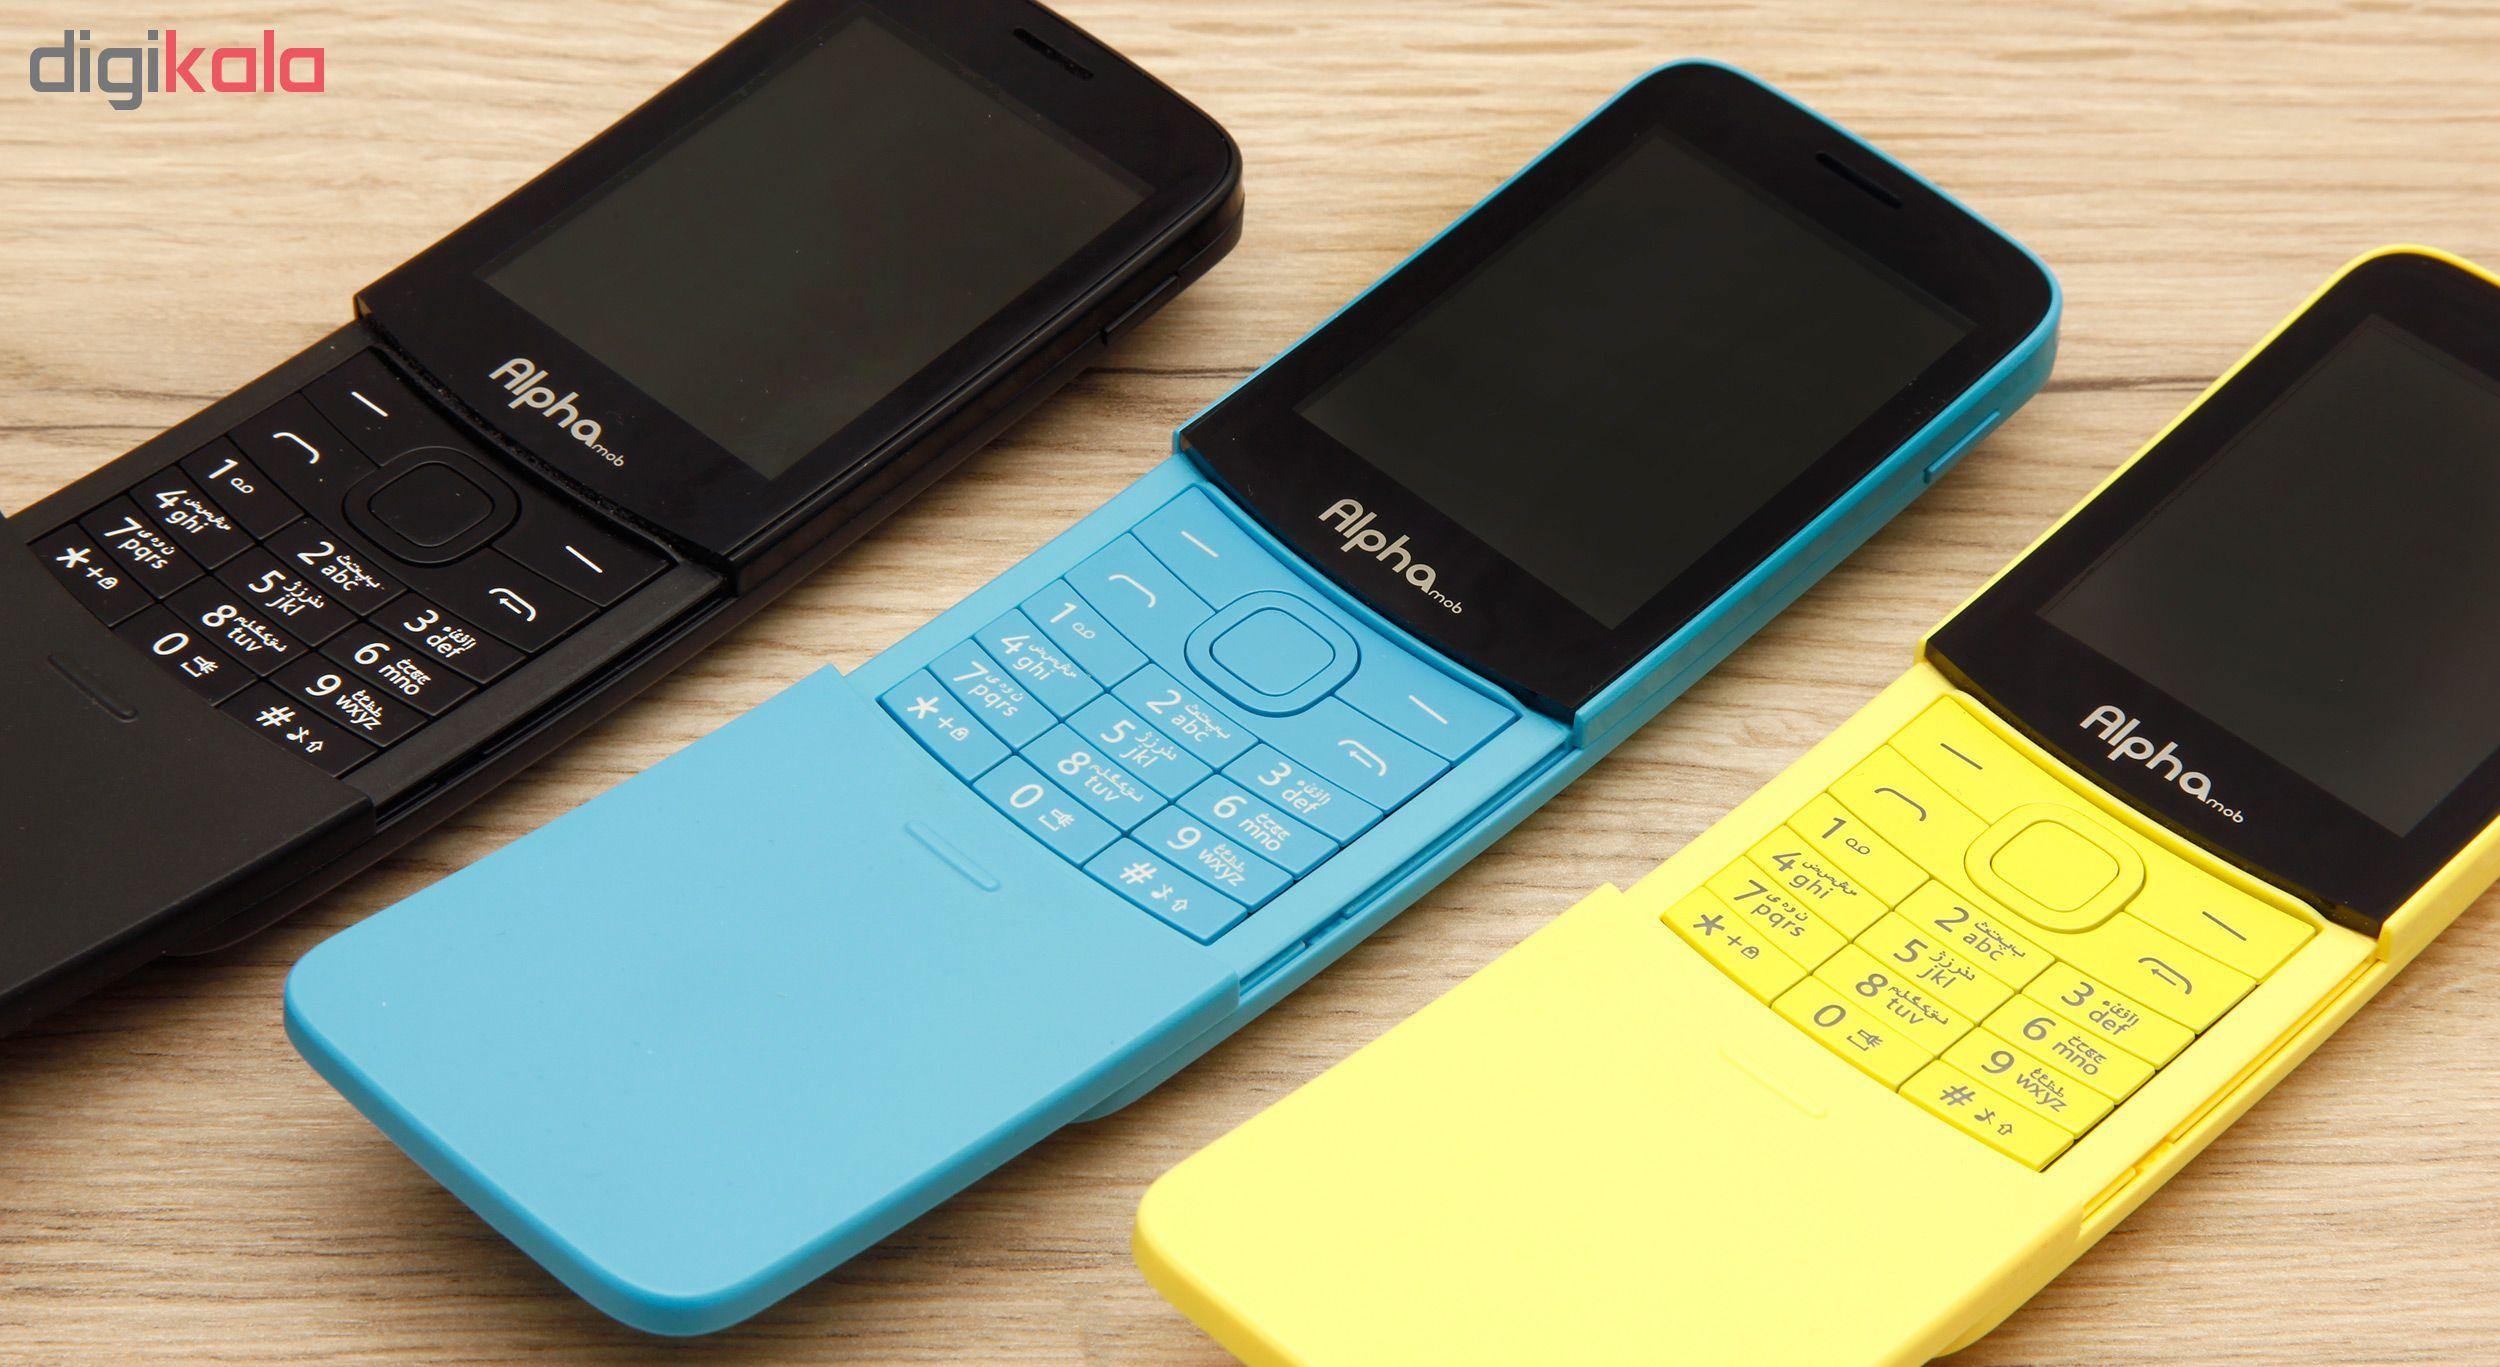 گوشی موبایل آلفاموب مدل x9 دو سیم کارت main 1 3